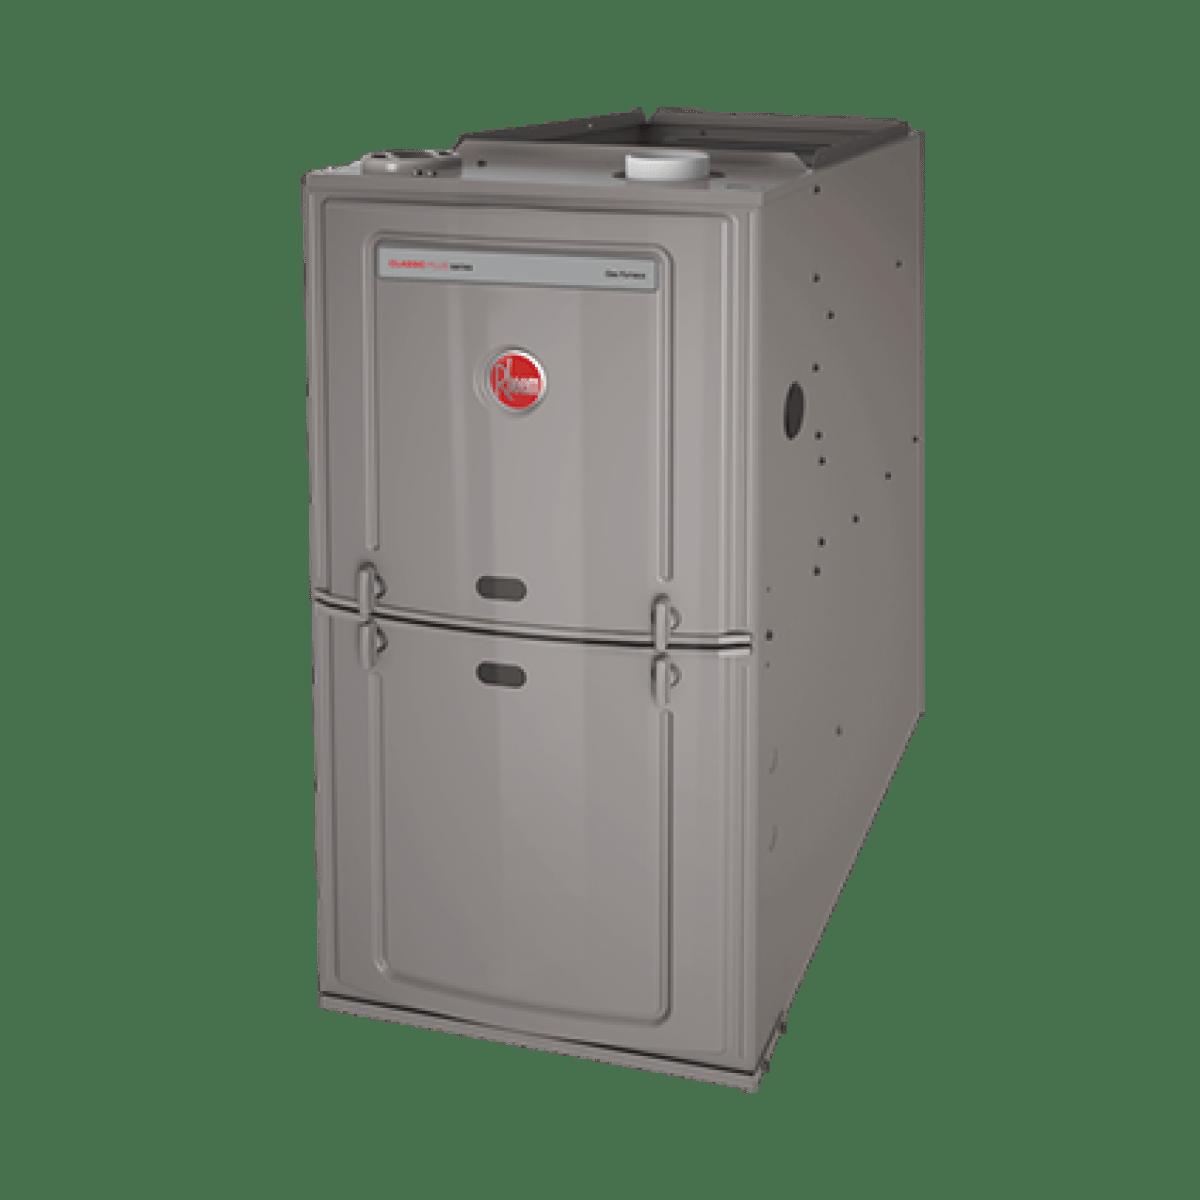 Rheem 125K BTU 80% Efficient Natural Gas Upflow/Horizontal